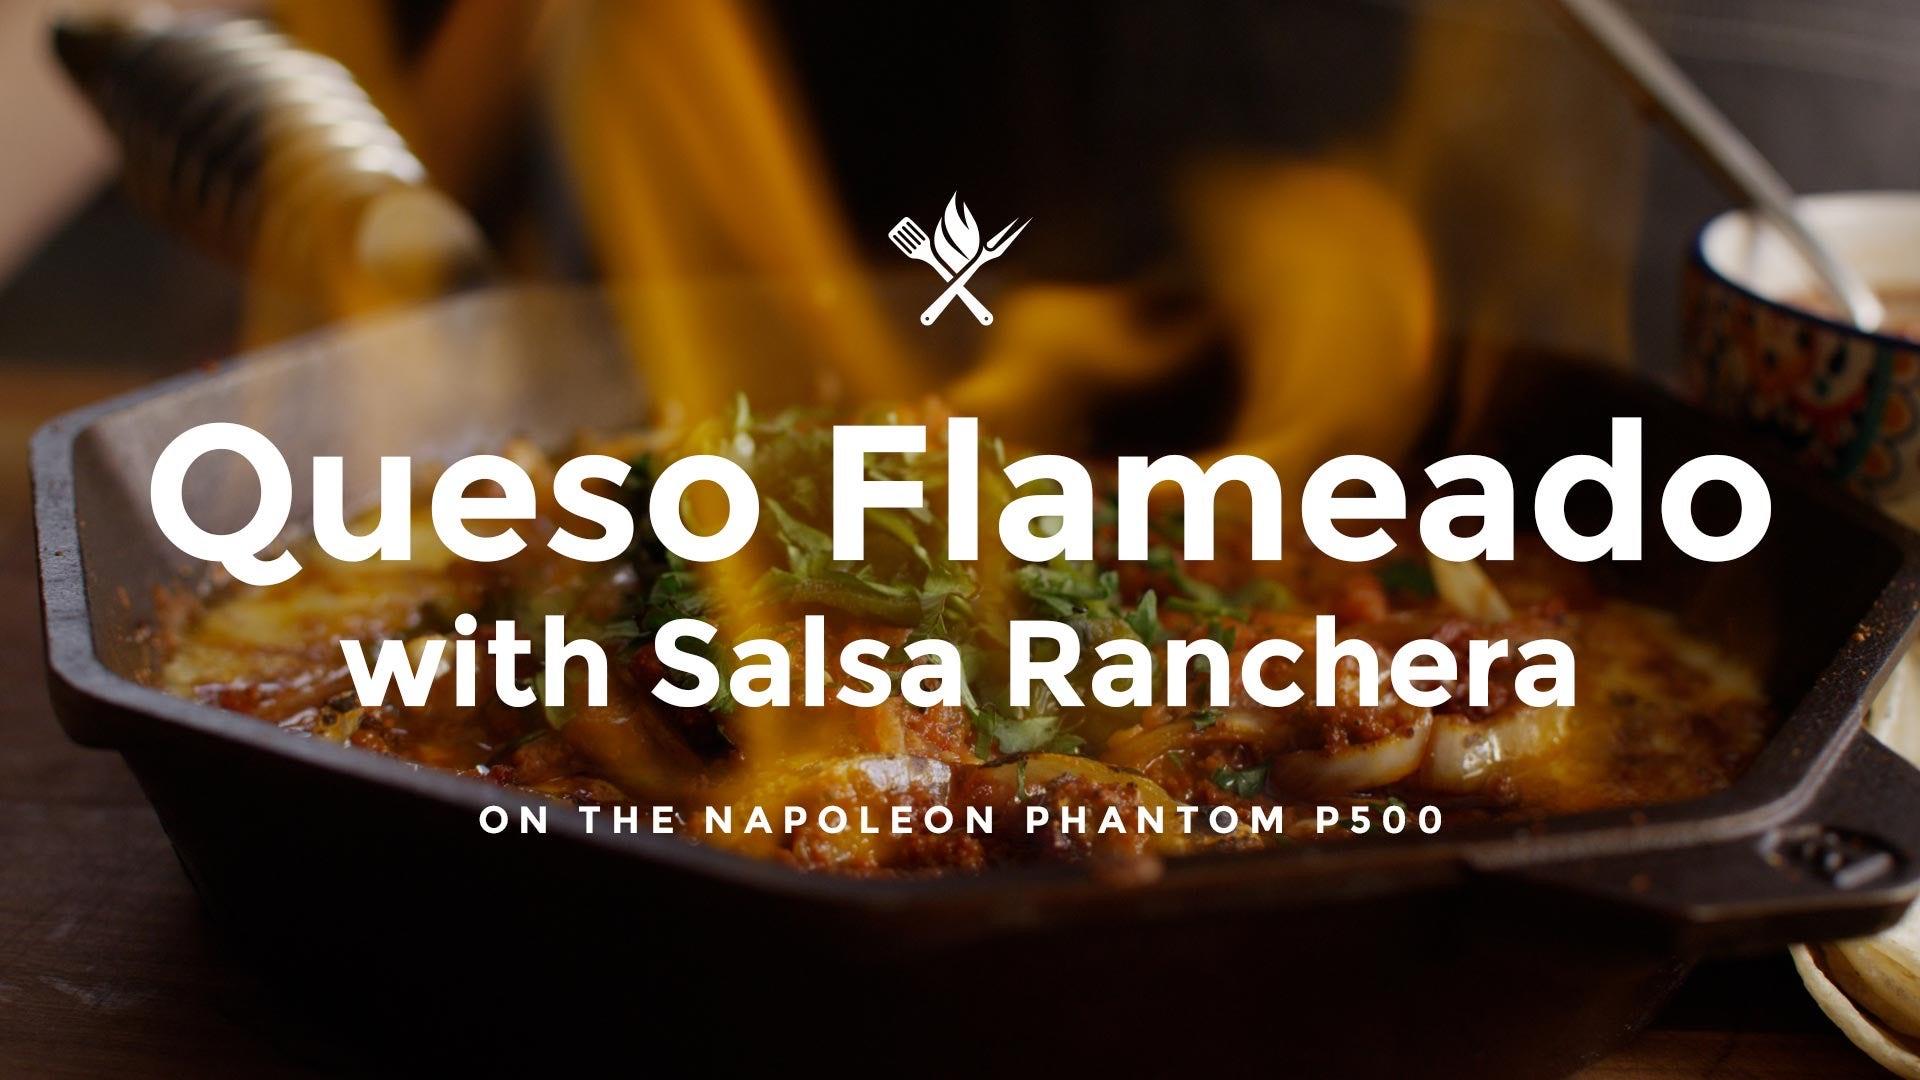 How to make Queso Fundido/Queso Flameado with Salsa Ranchera